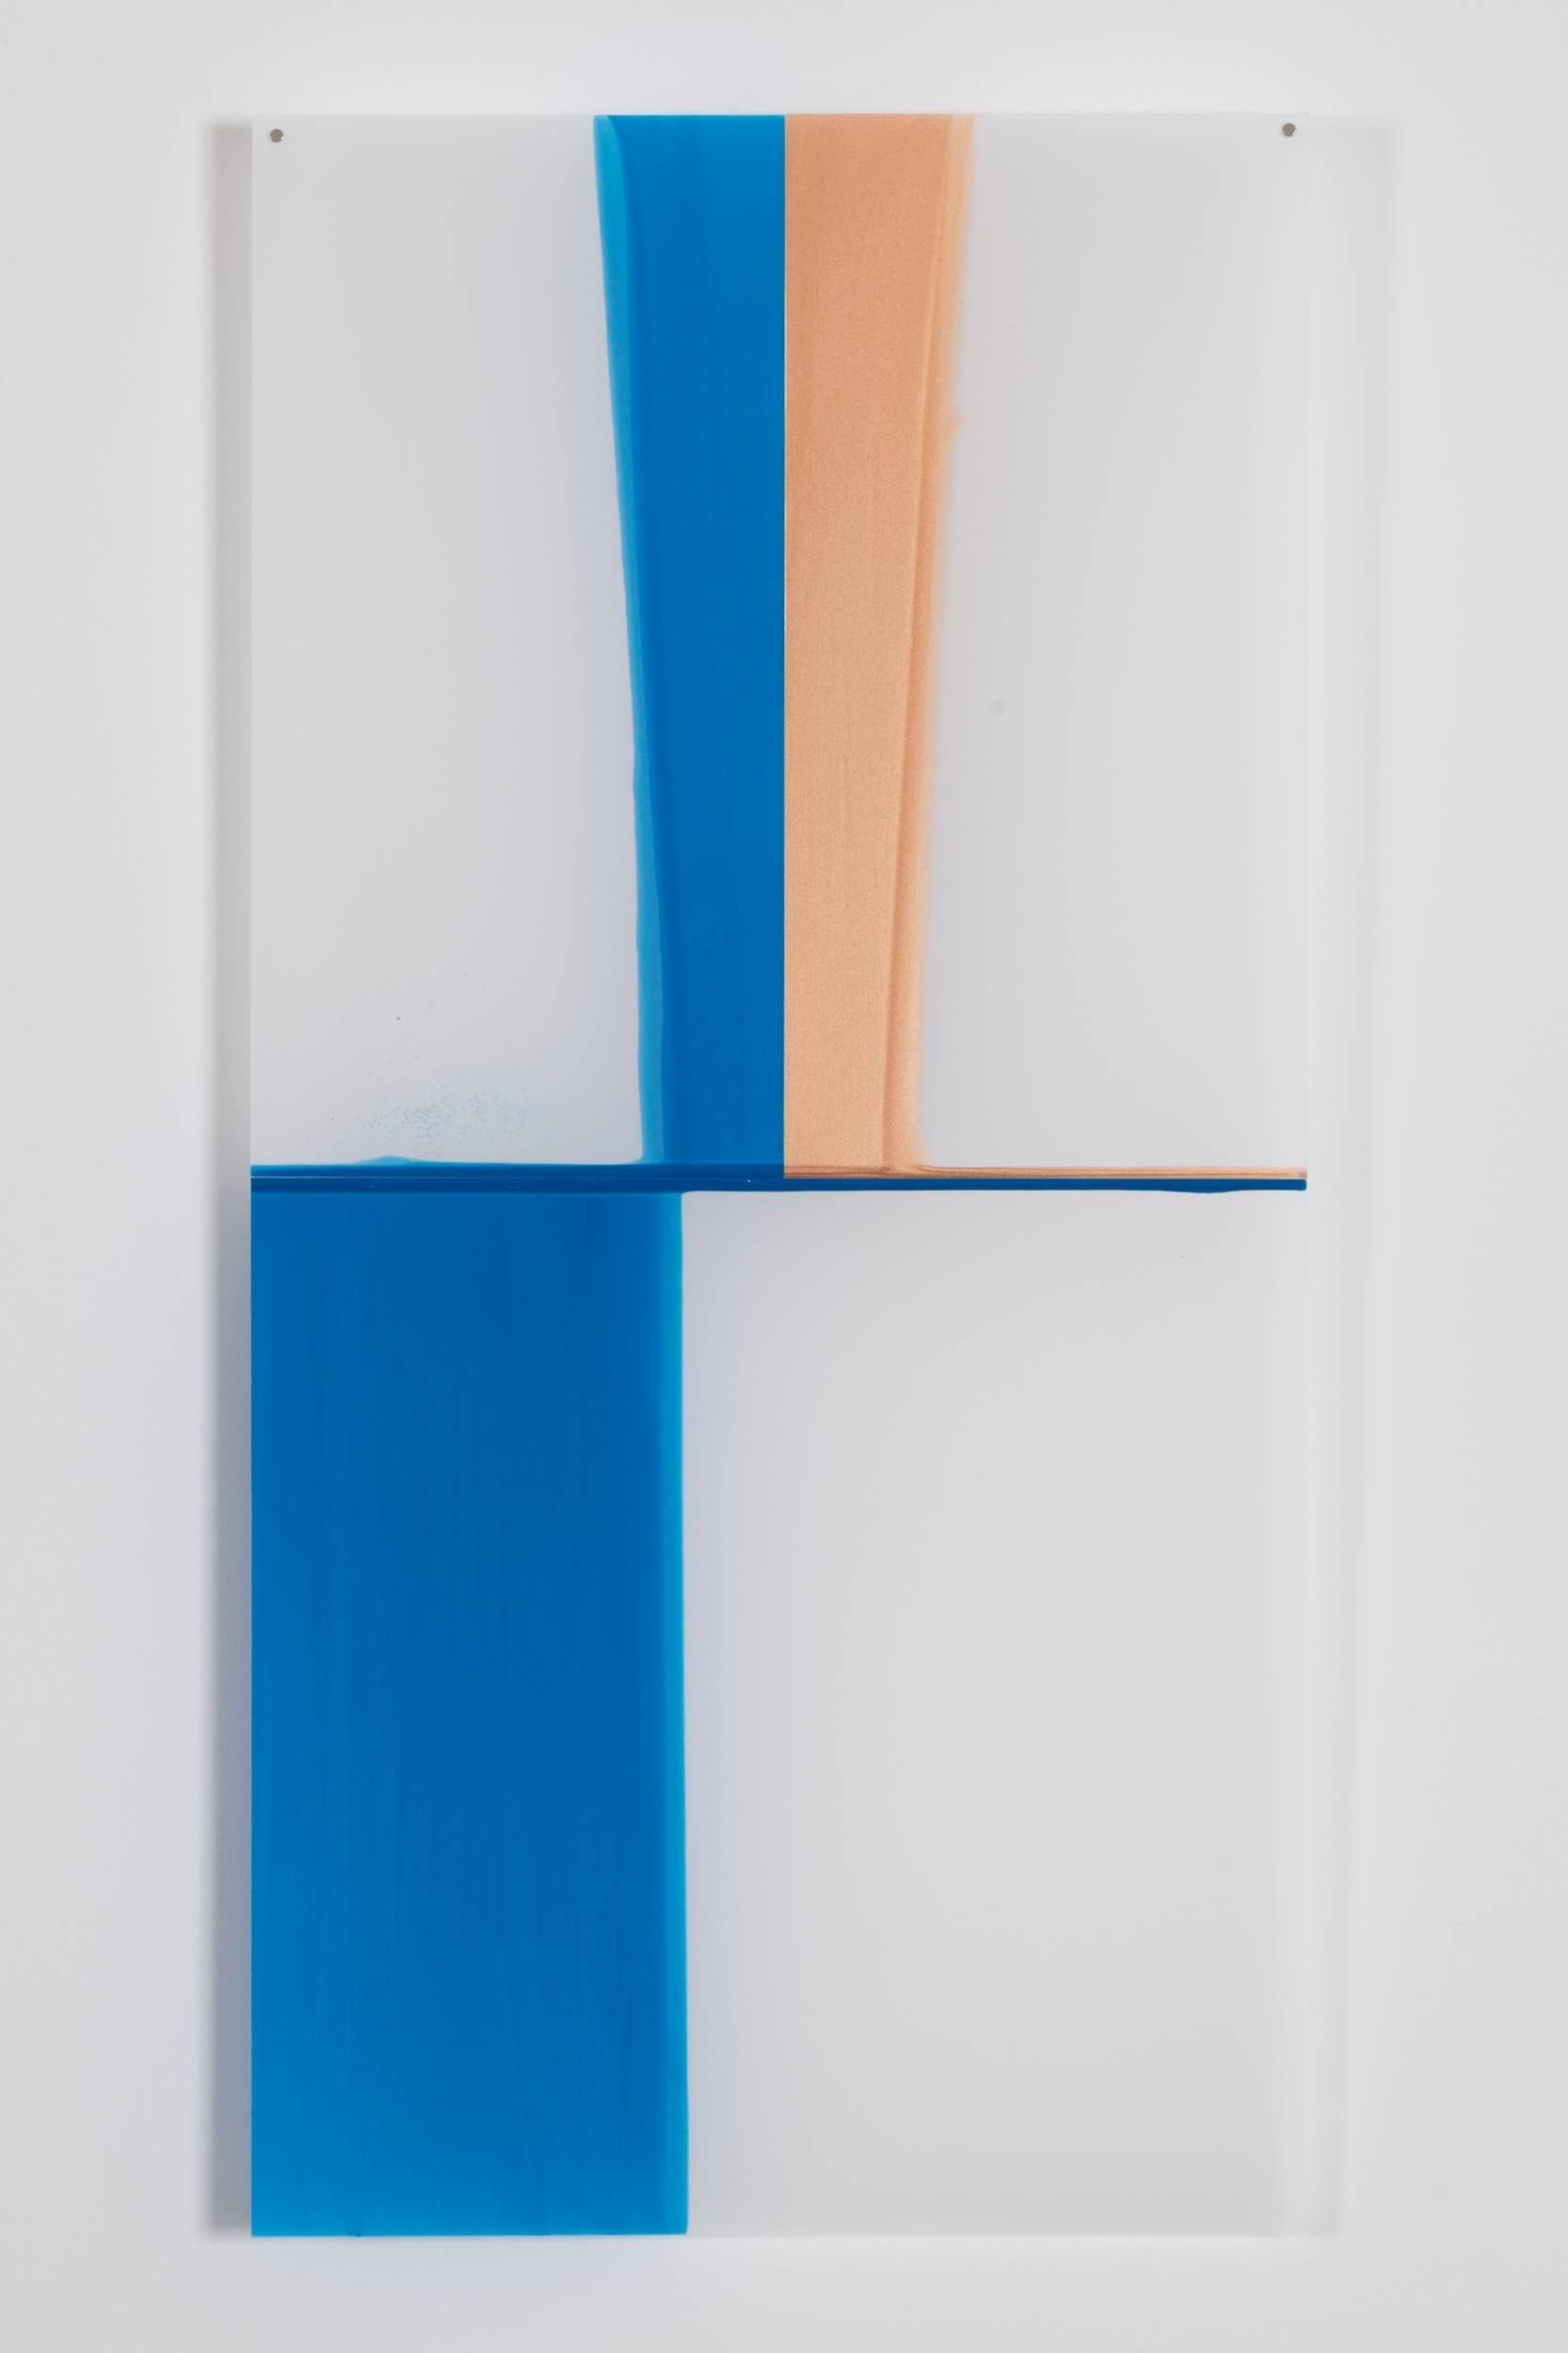 Mary Schiliro, Random Dip 4, 2015, Painting, Acrylic on Mylar, Abstraction